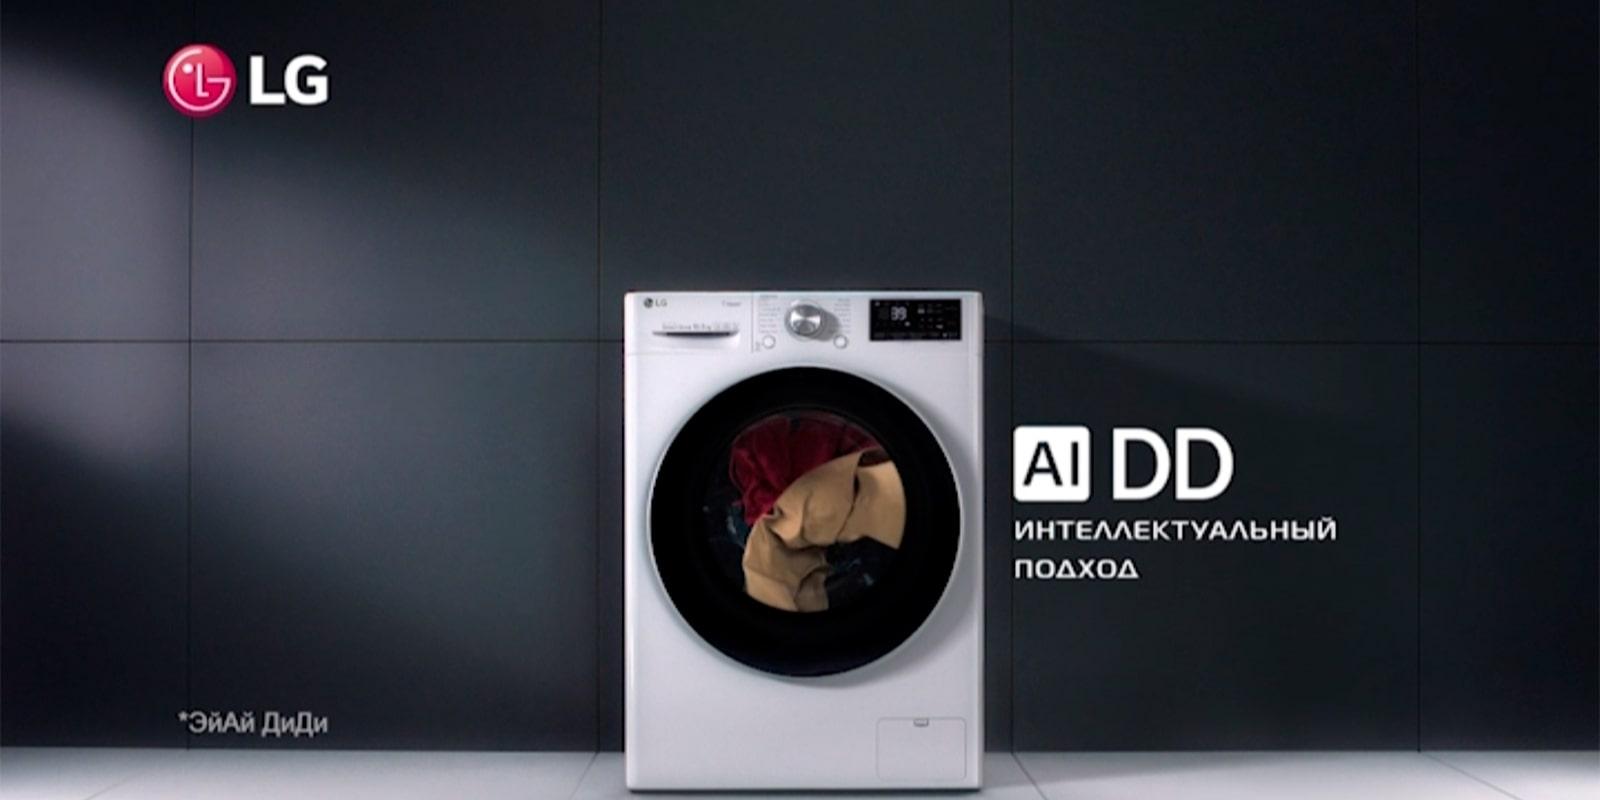 WM-VIDEO-AIDD-14112019_Desktop